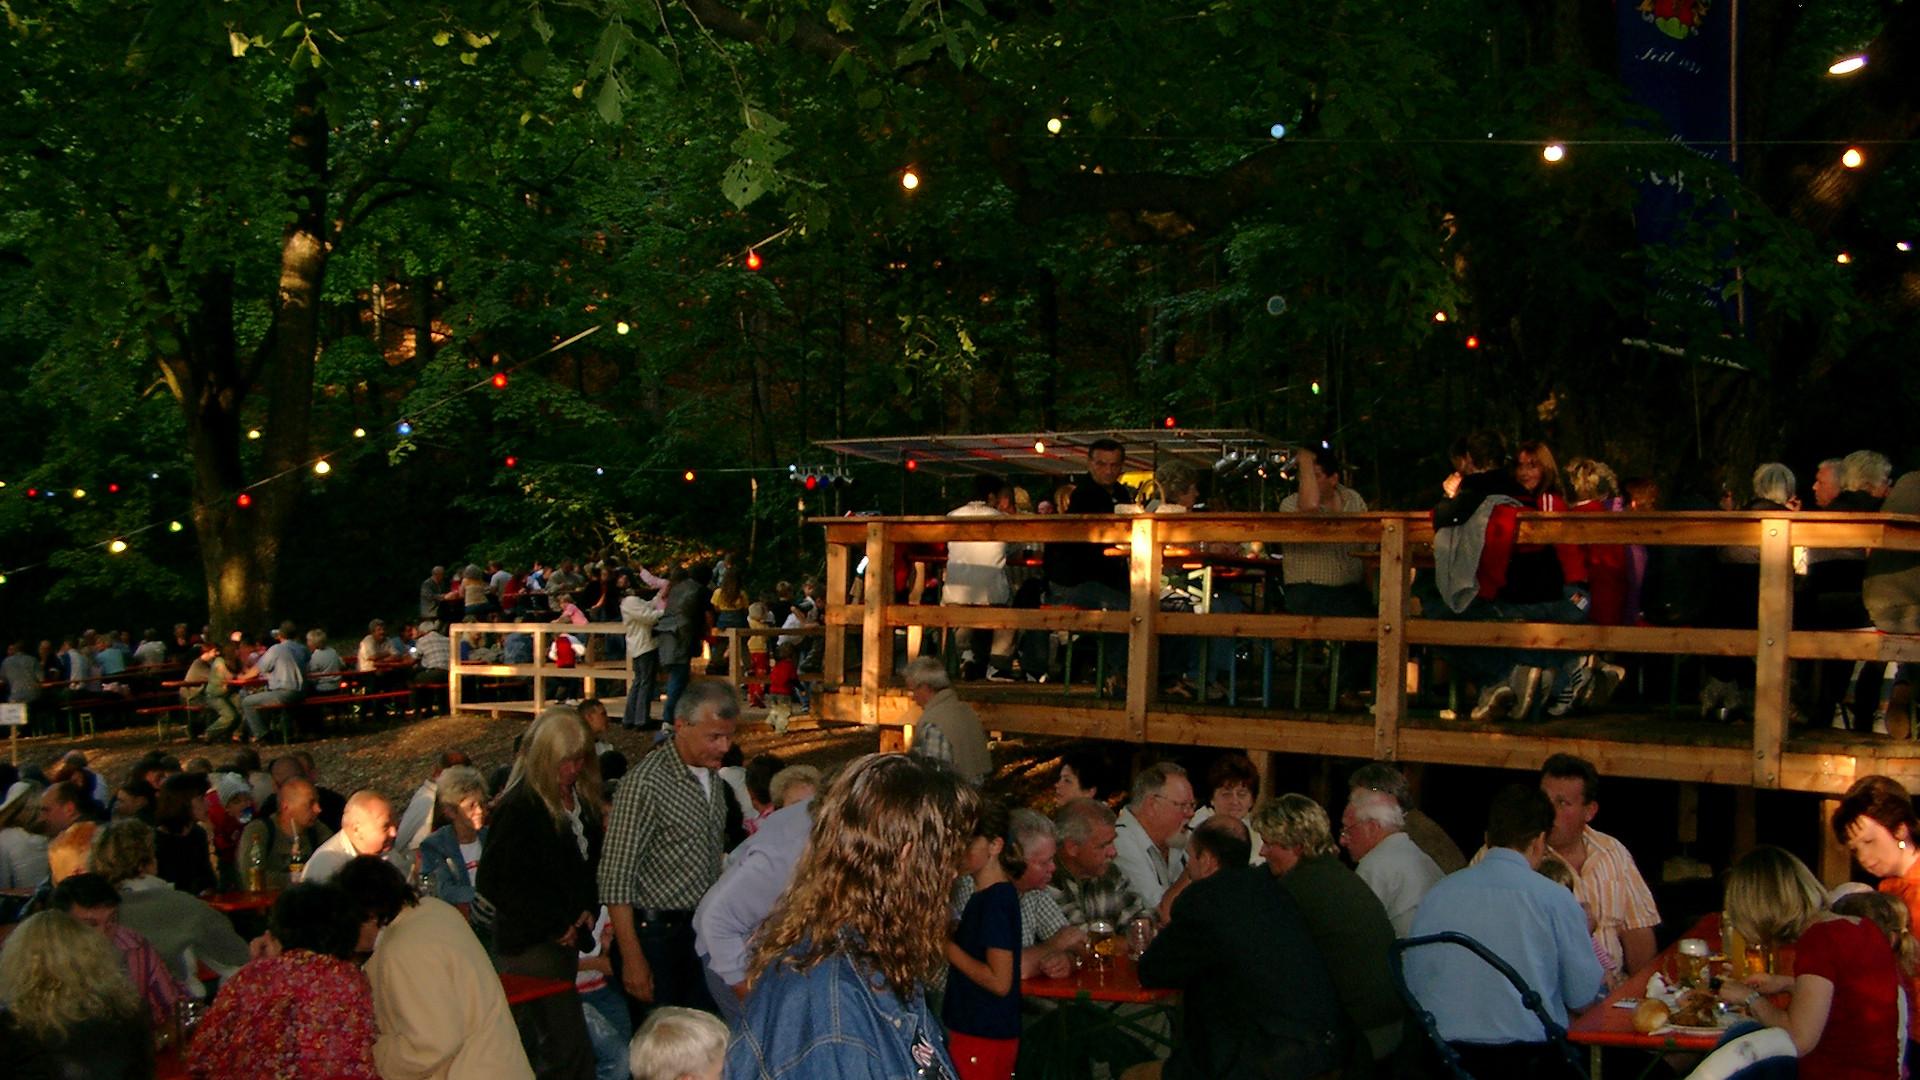 Lindenfestplatz